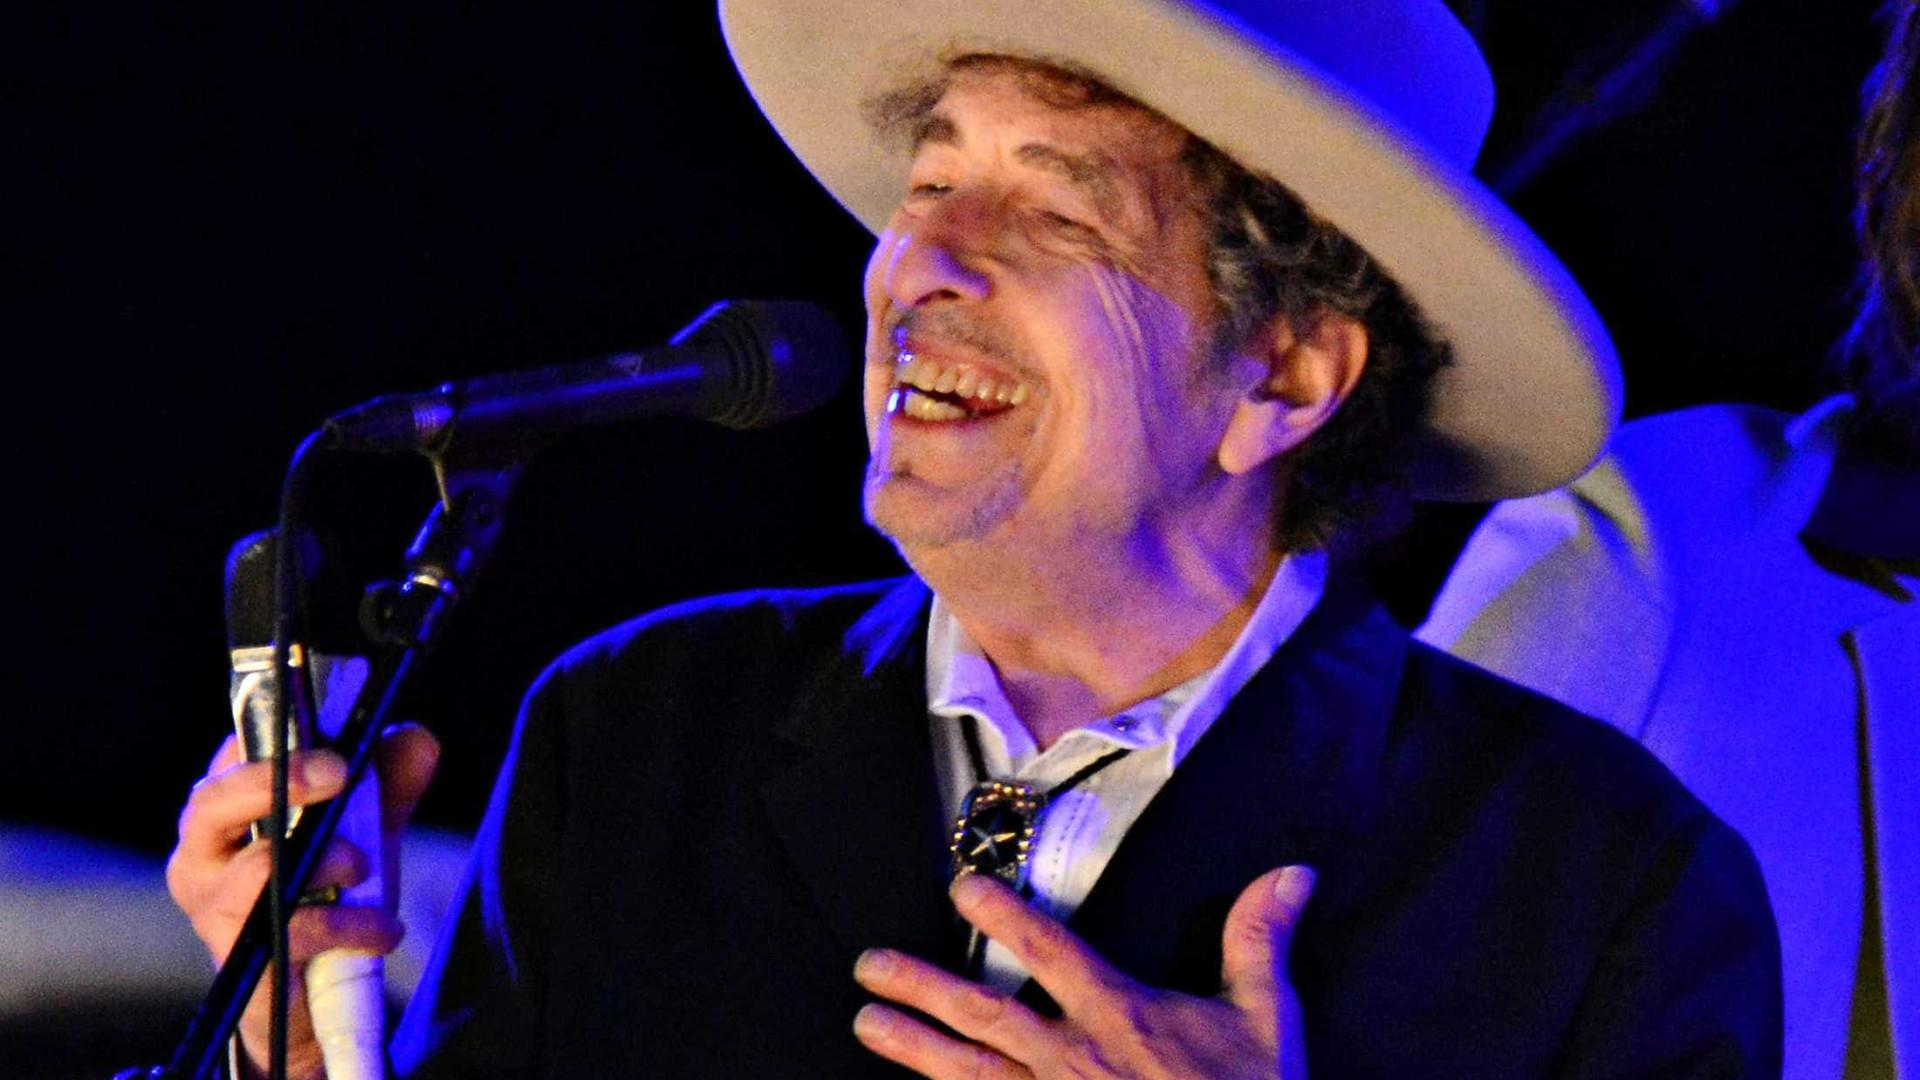 Bob Dylan lança música inédita de 17 minutos após oito anos de hiato